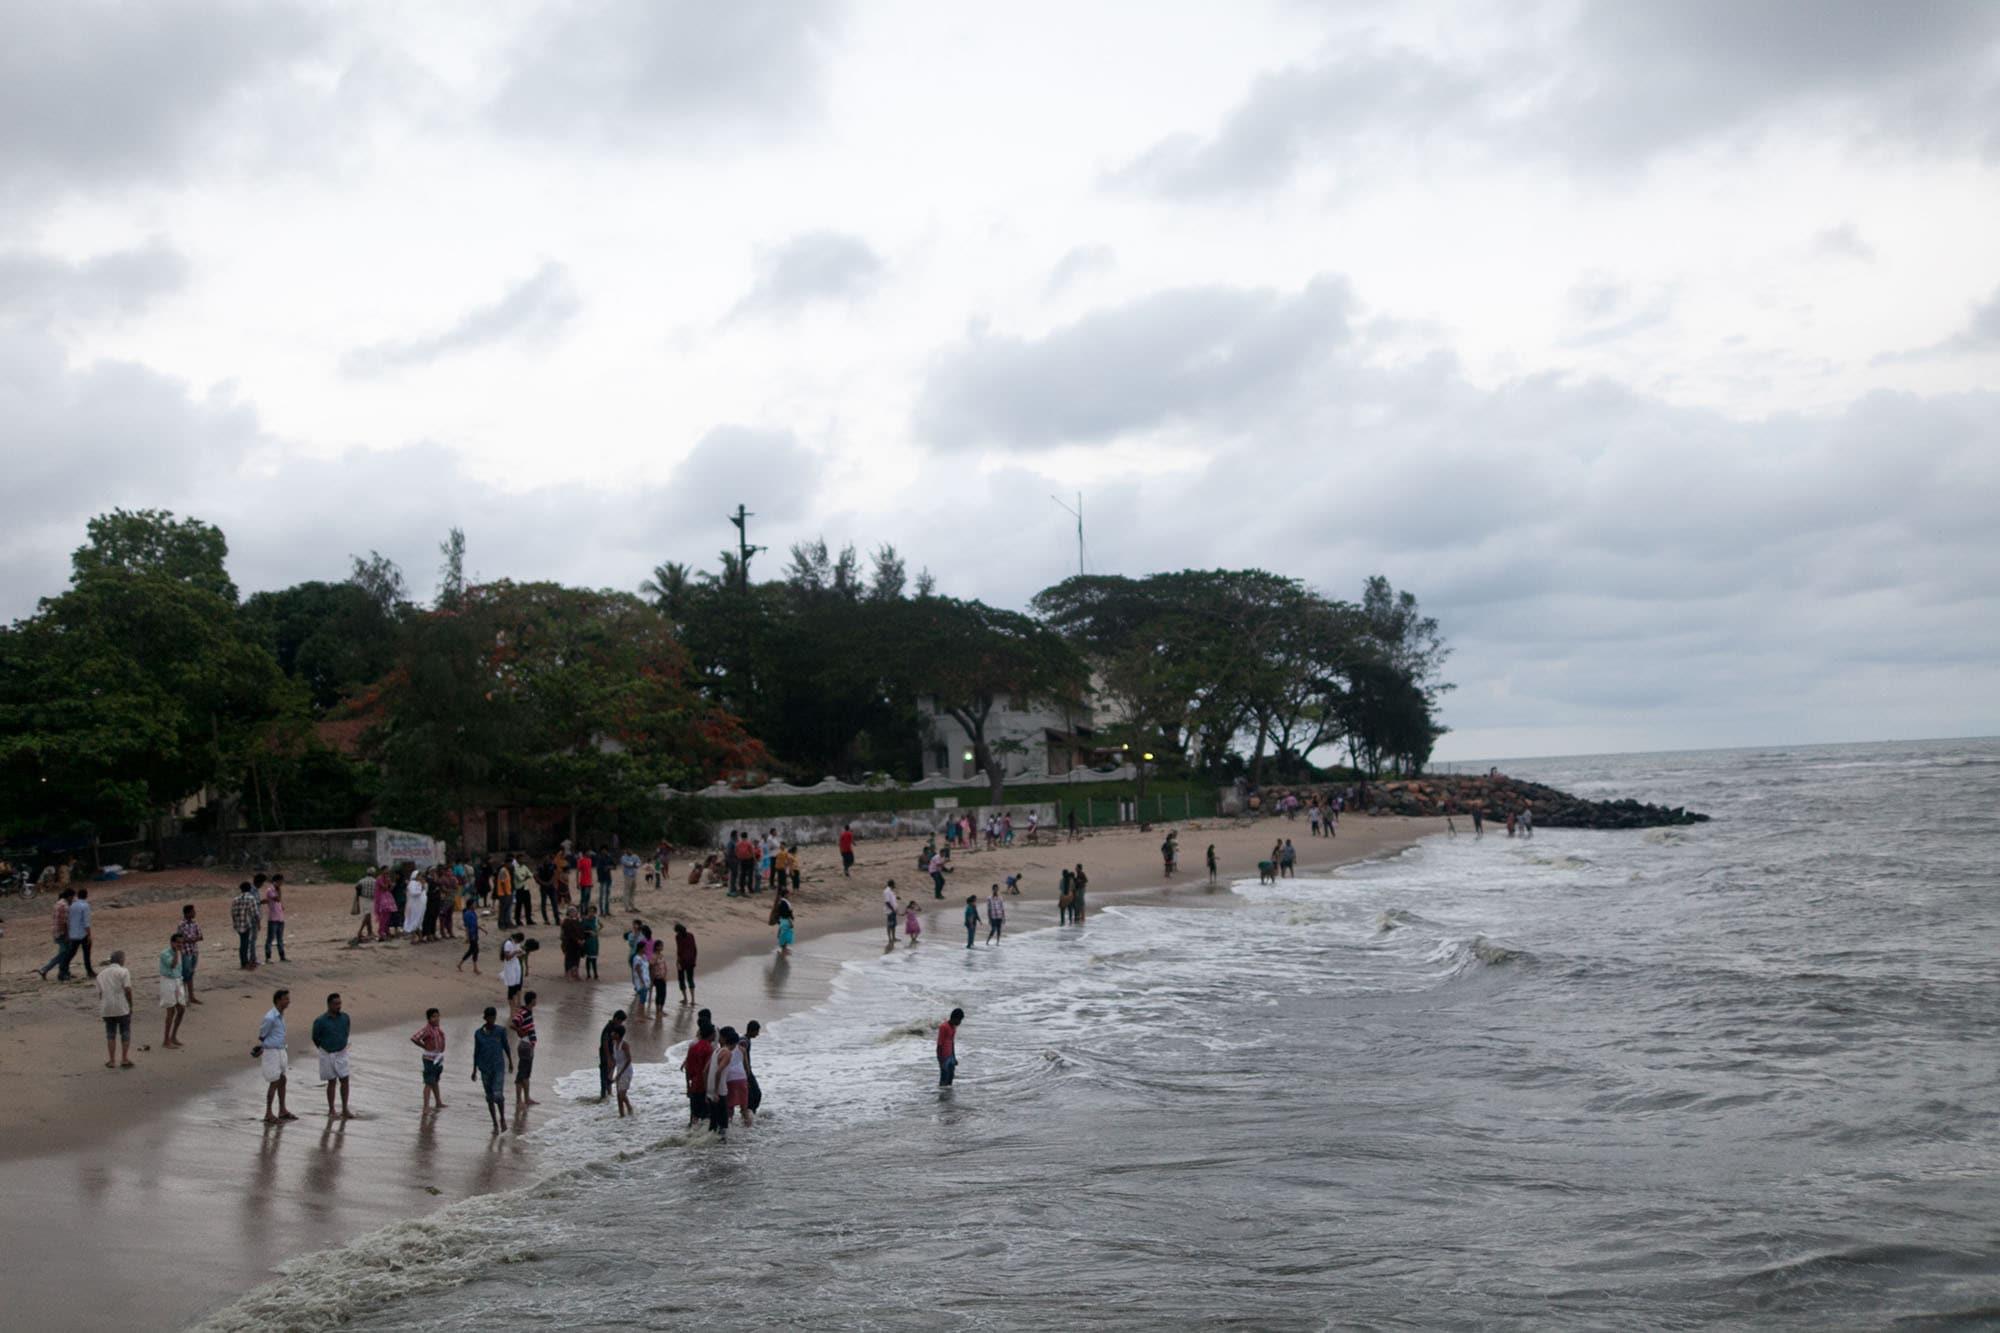 The beach in Kochi, India (Cochin) in Kerala.